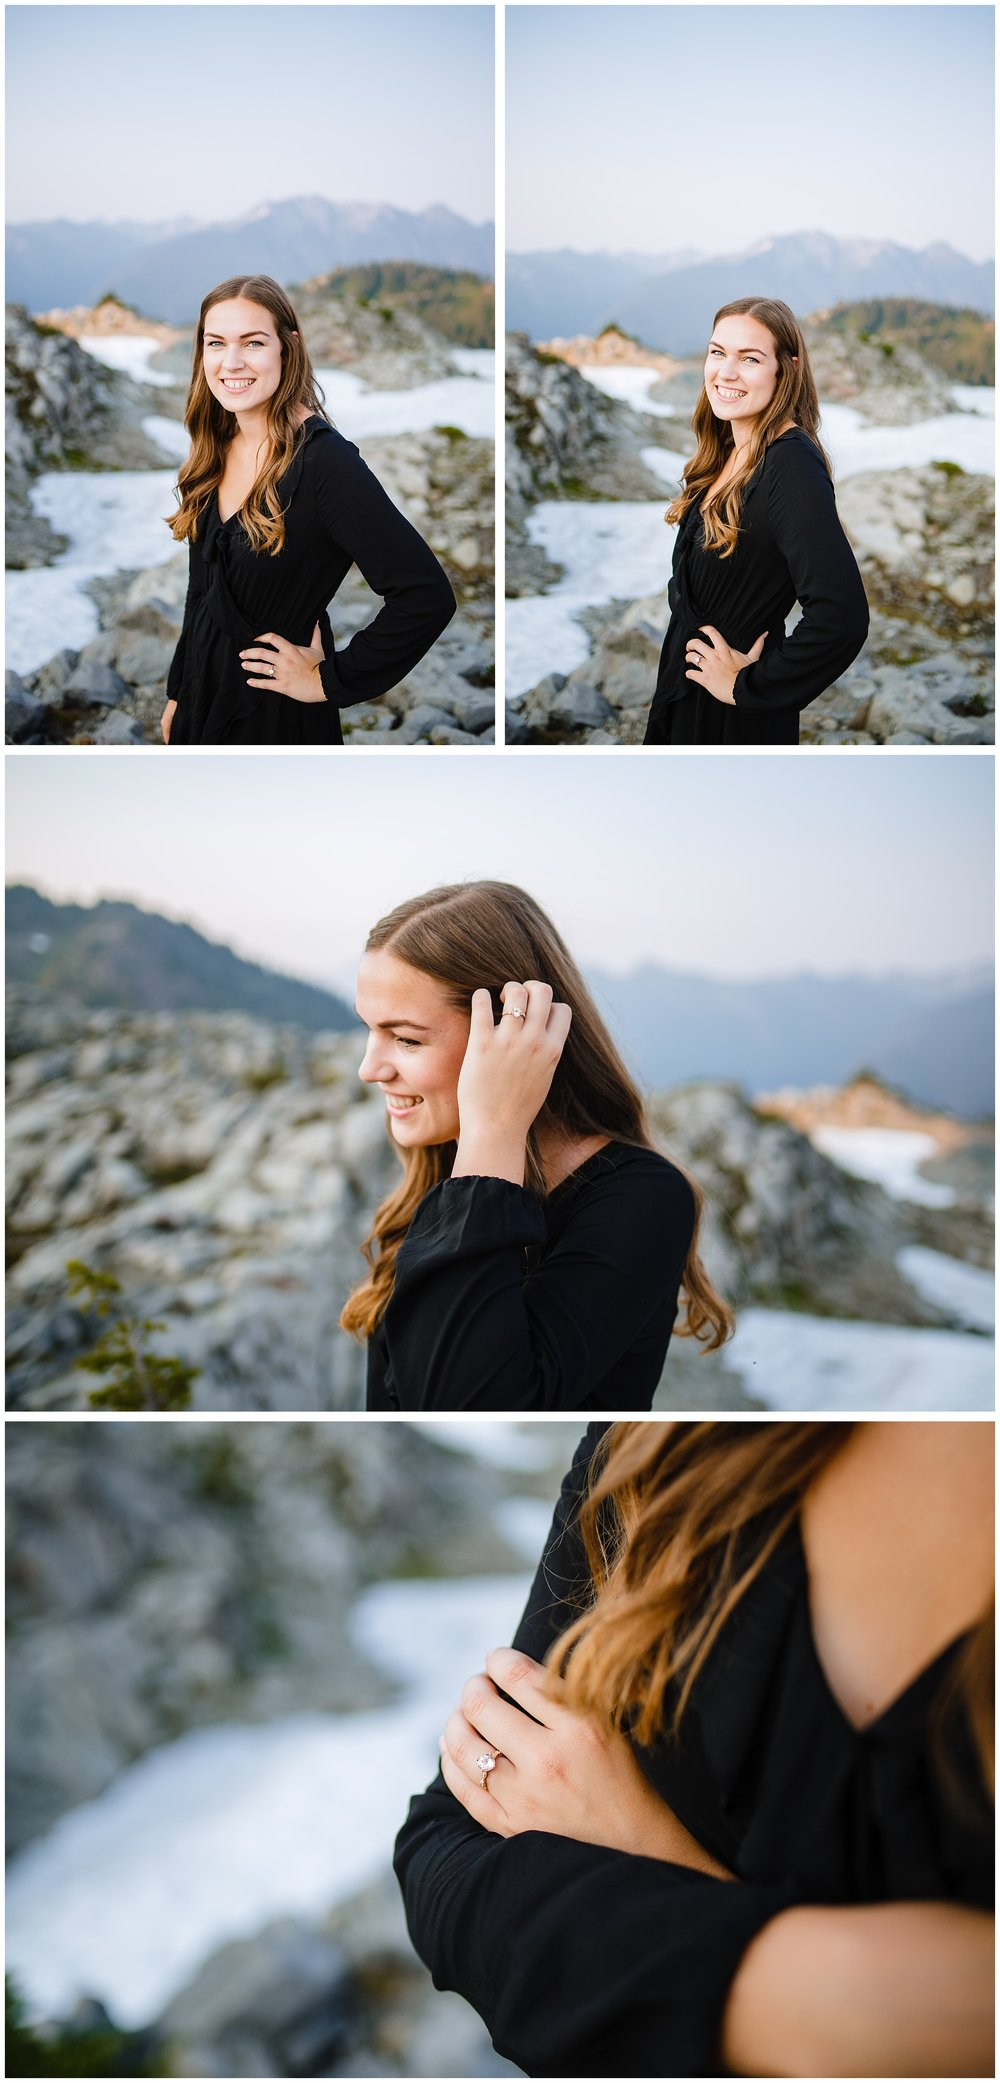 Mt Baker Artist Point Engagement Photography Mountain Inspo Couples Photographer Evening Romantic_0002.jpg